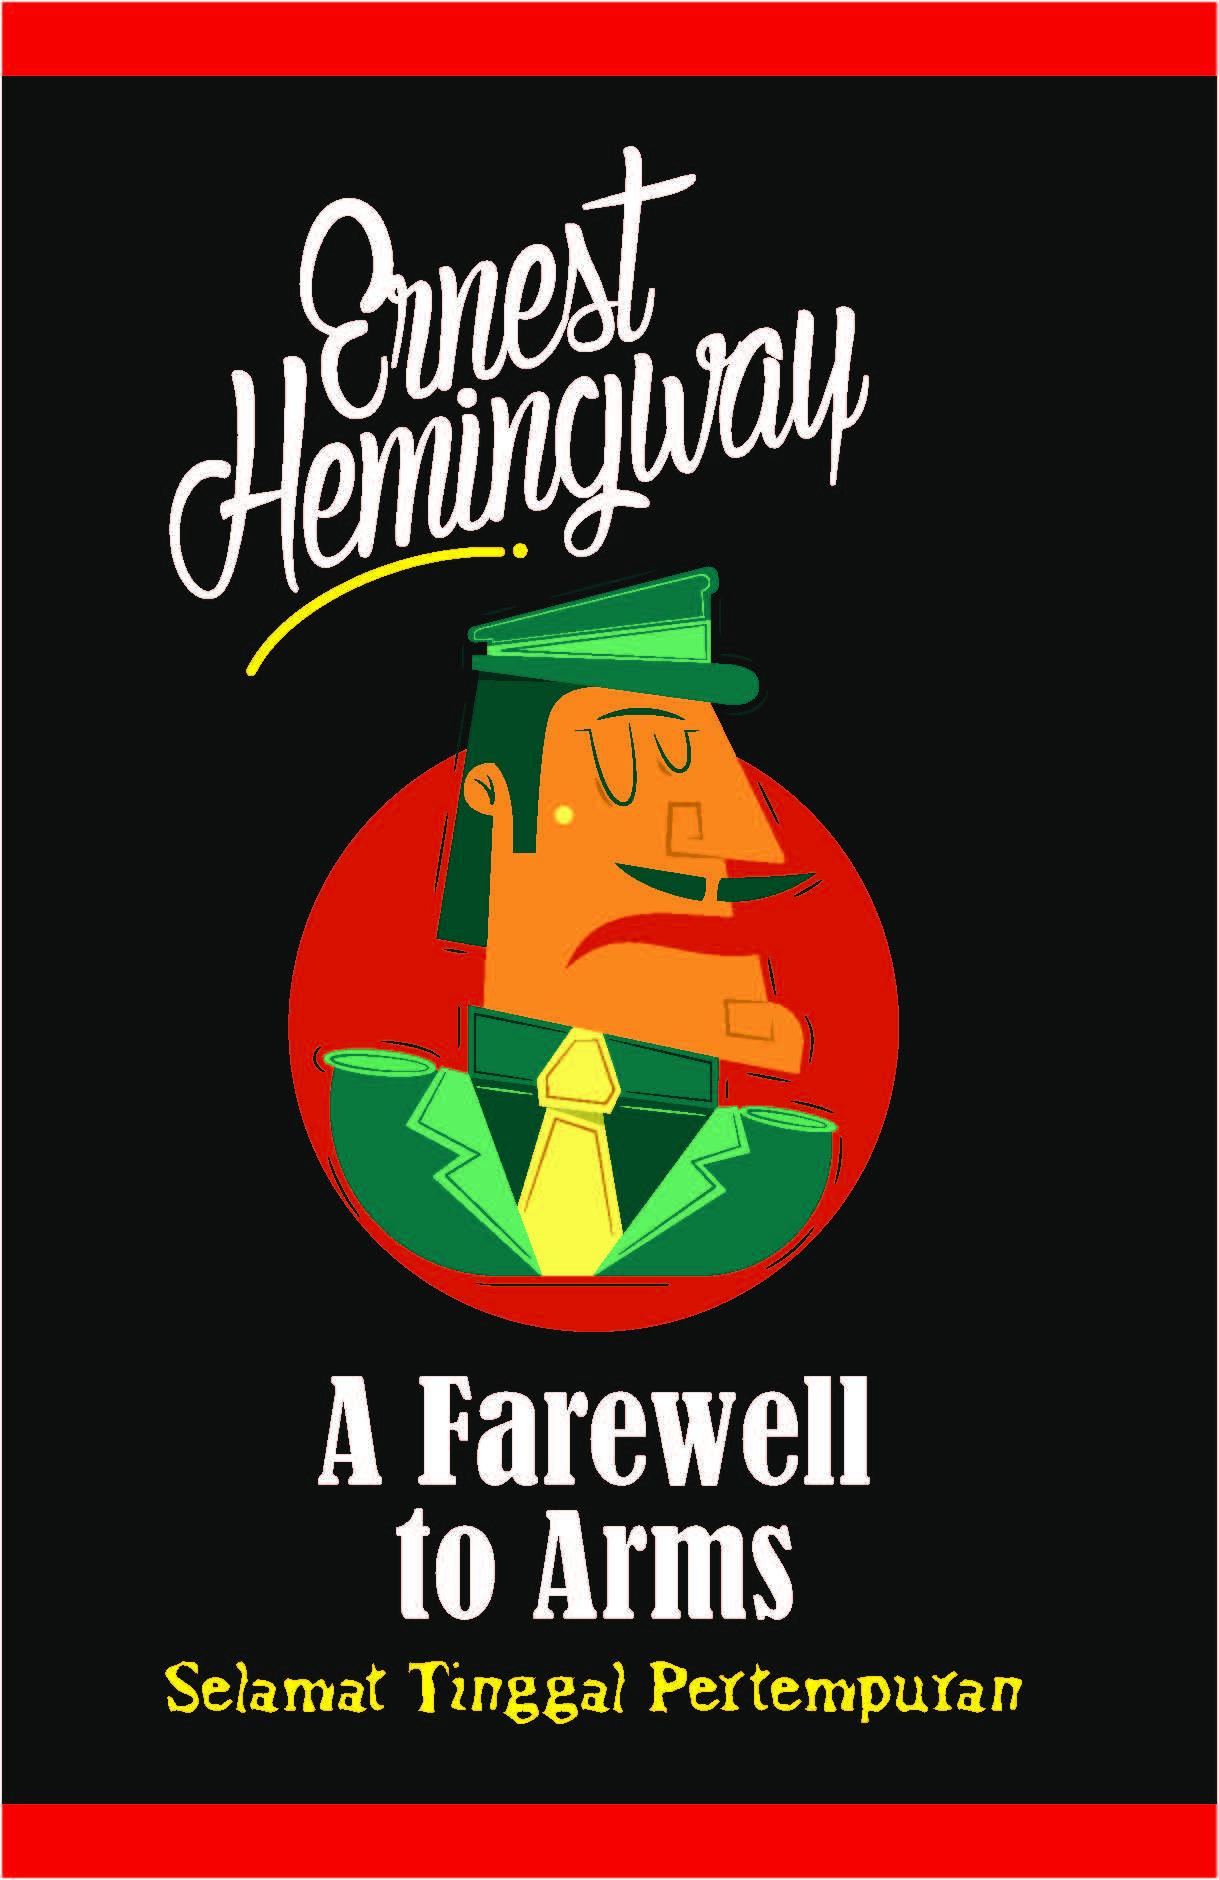 A farewell to arms [sumber elektronis] = Selamat tinggal pertempuran